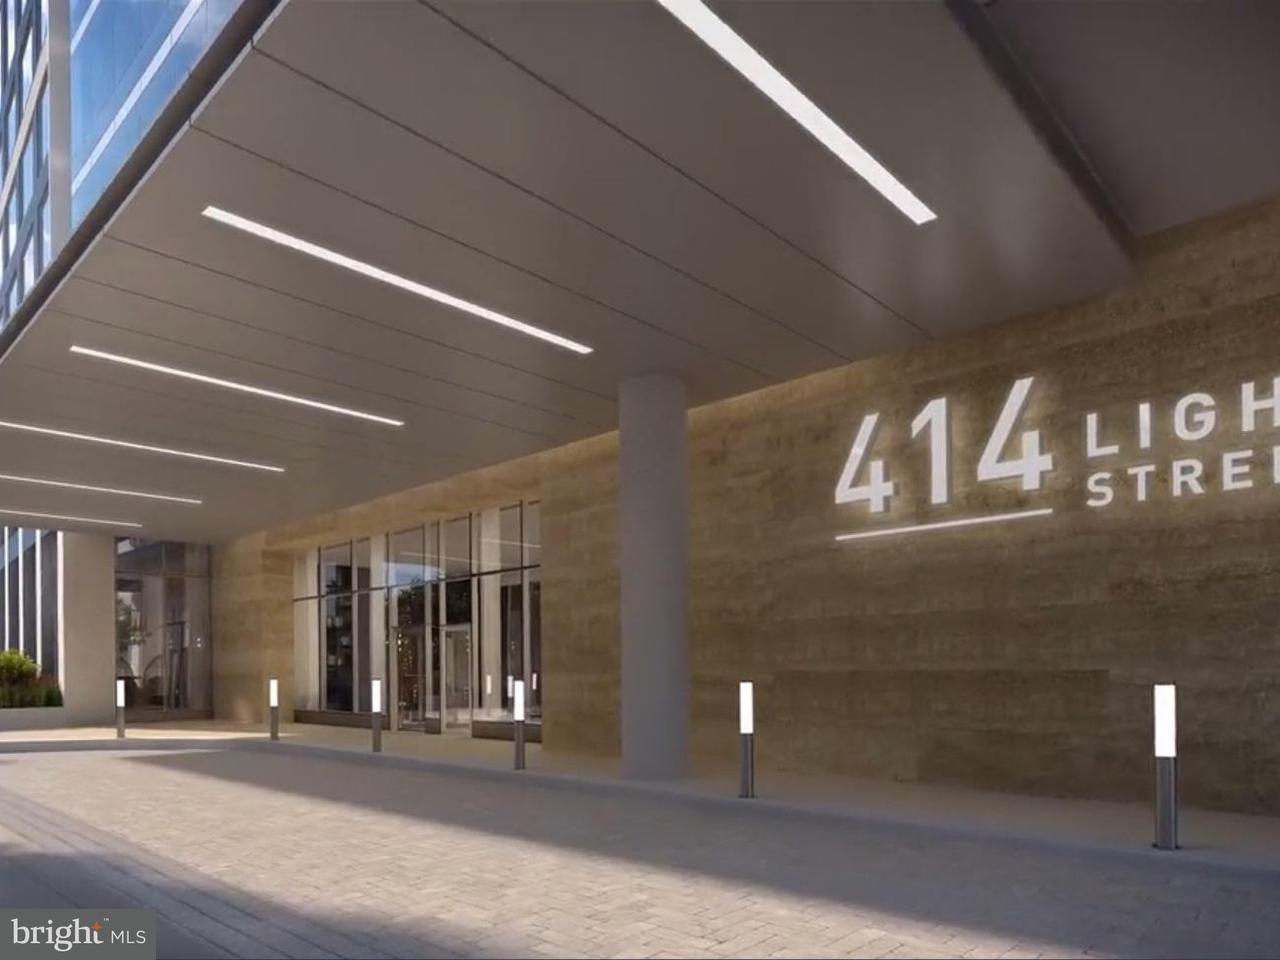 Condominium for Rent at 414 Light St #411 Baltimore, Maryland 21202 United States